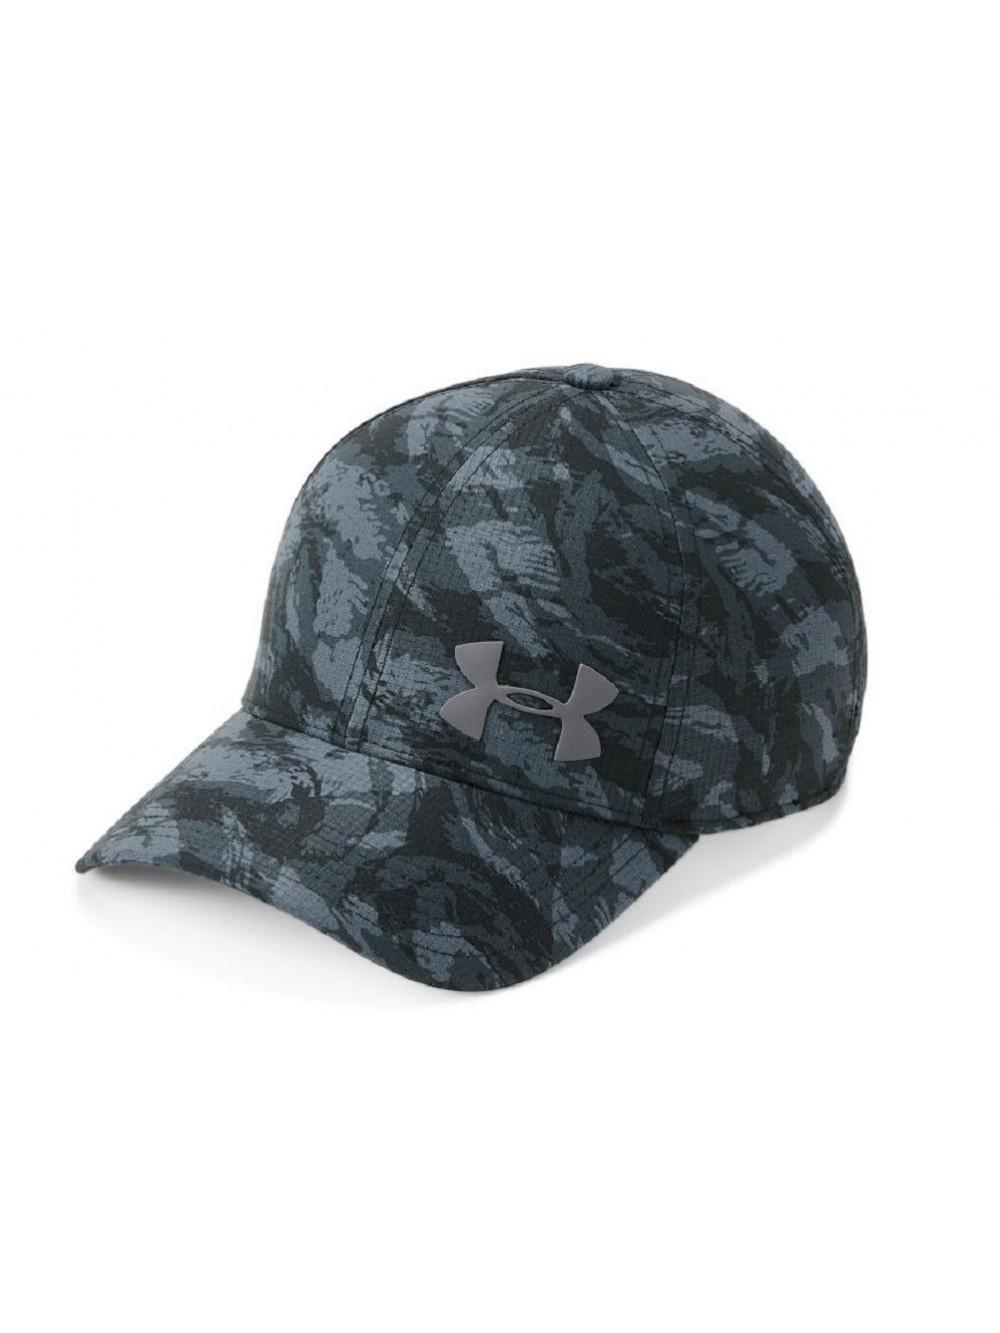 Šiltovka Under Armour Airvent Core maskáčová čierna